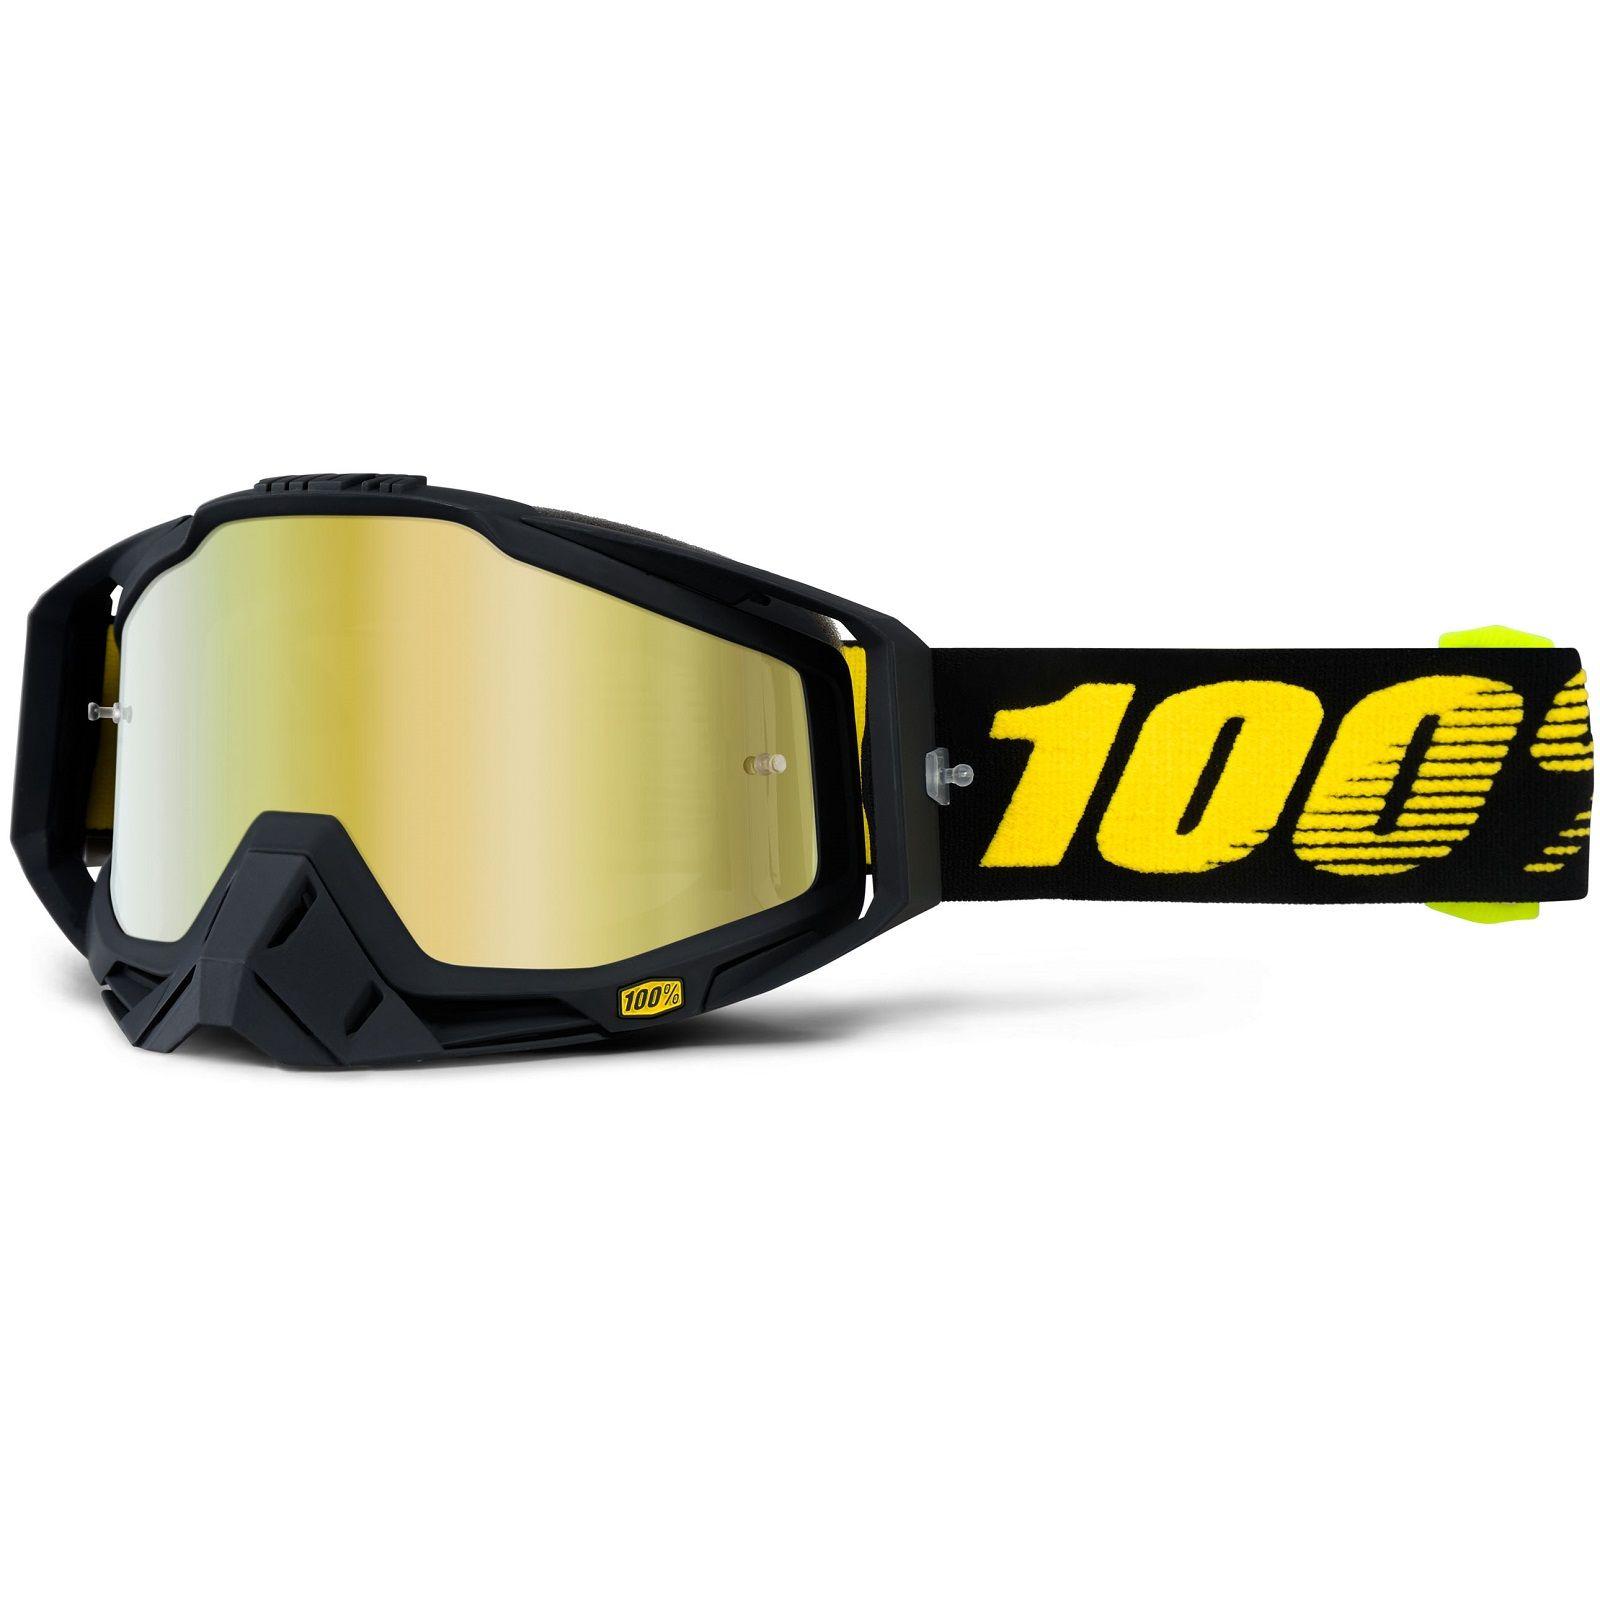 100 Percent Racecraft Raceday Gold Mirror Goggles